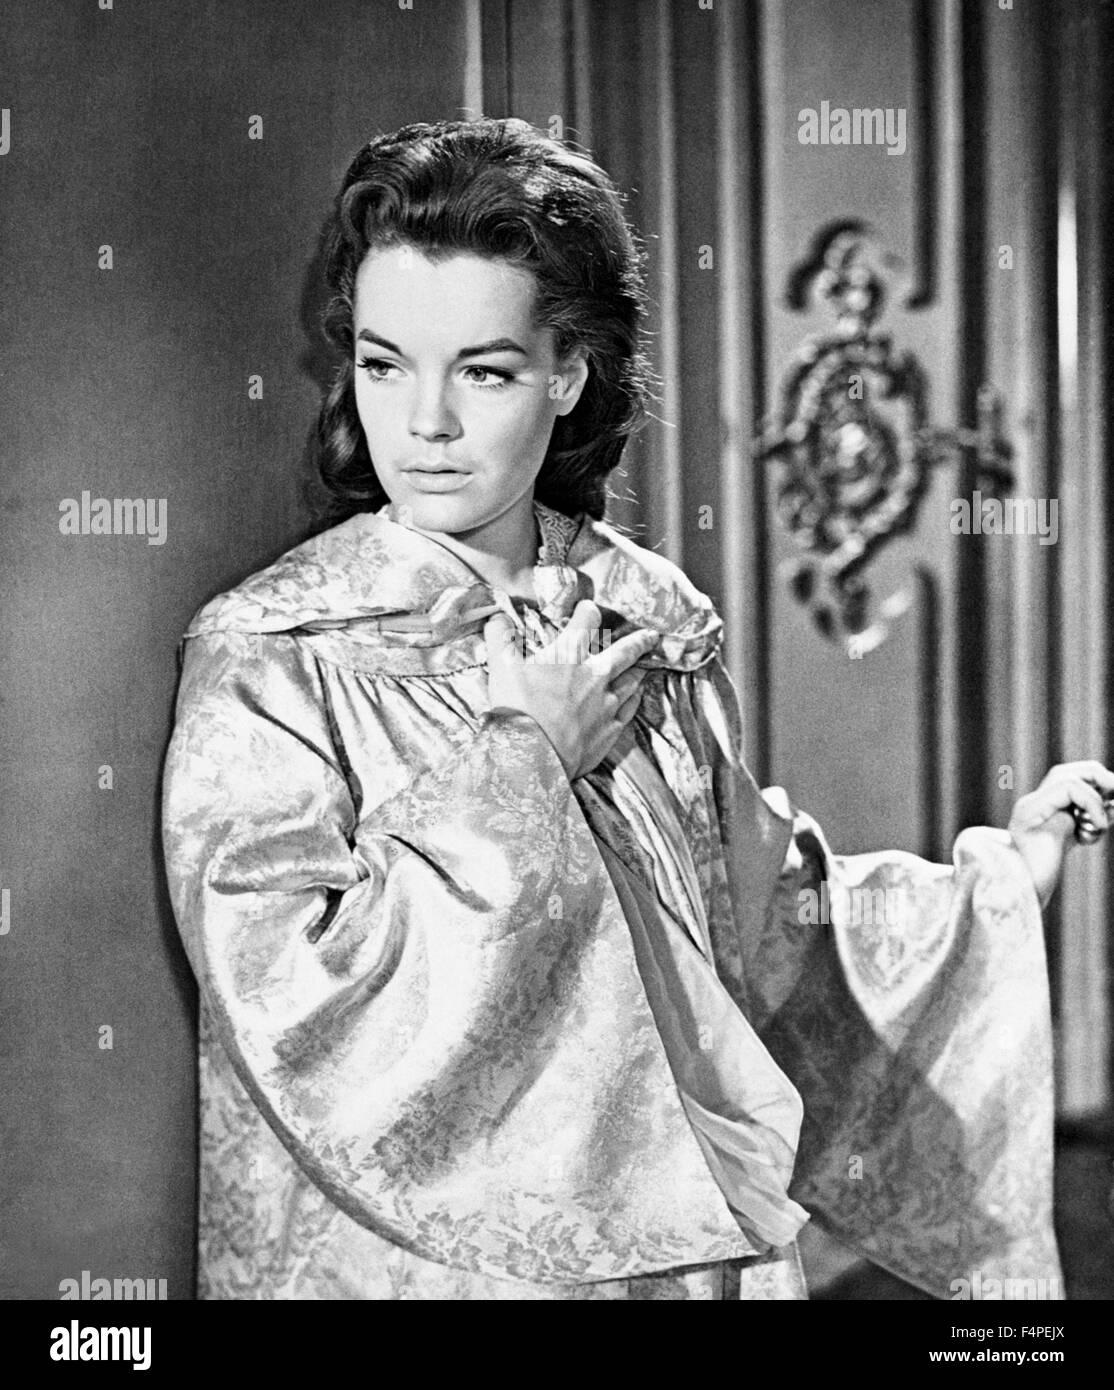 Romy Schneider / Sissi : The Fateful Years of an Empress / 1957 directed by Ernst Marischka - Stock Image